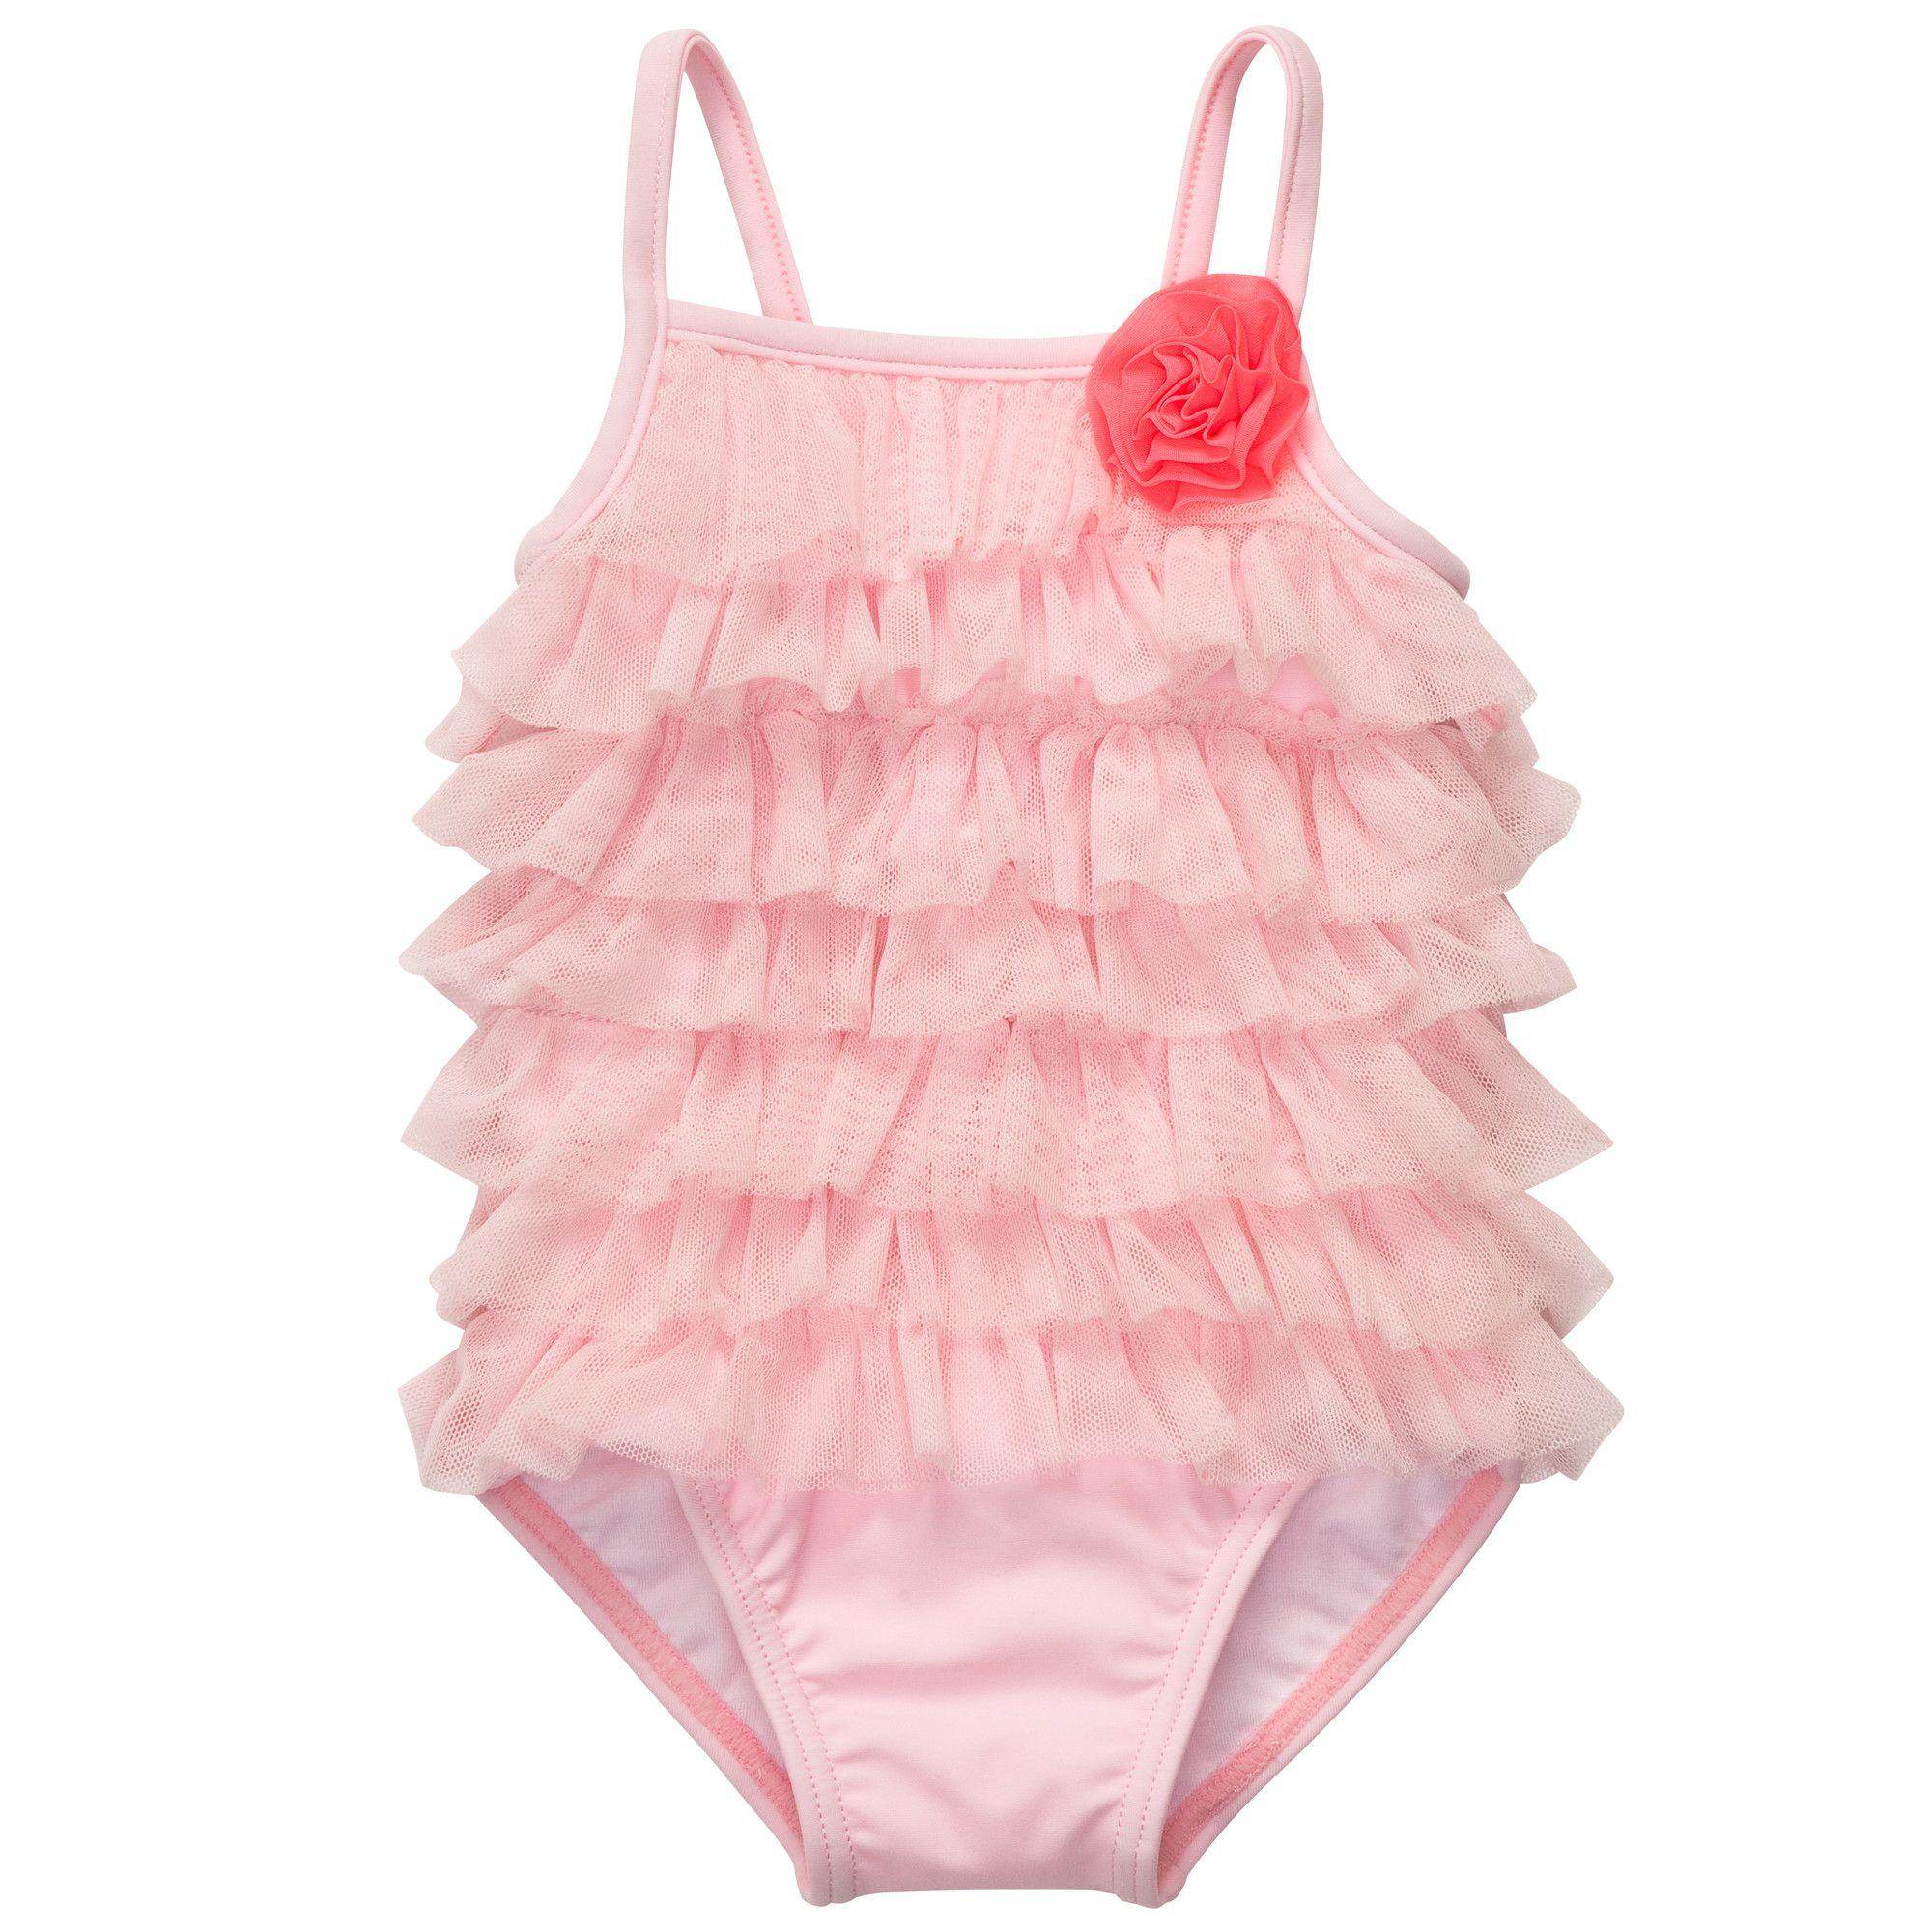 1 Piece Ruffle Swimsuit Baby Girl Swimwear